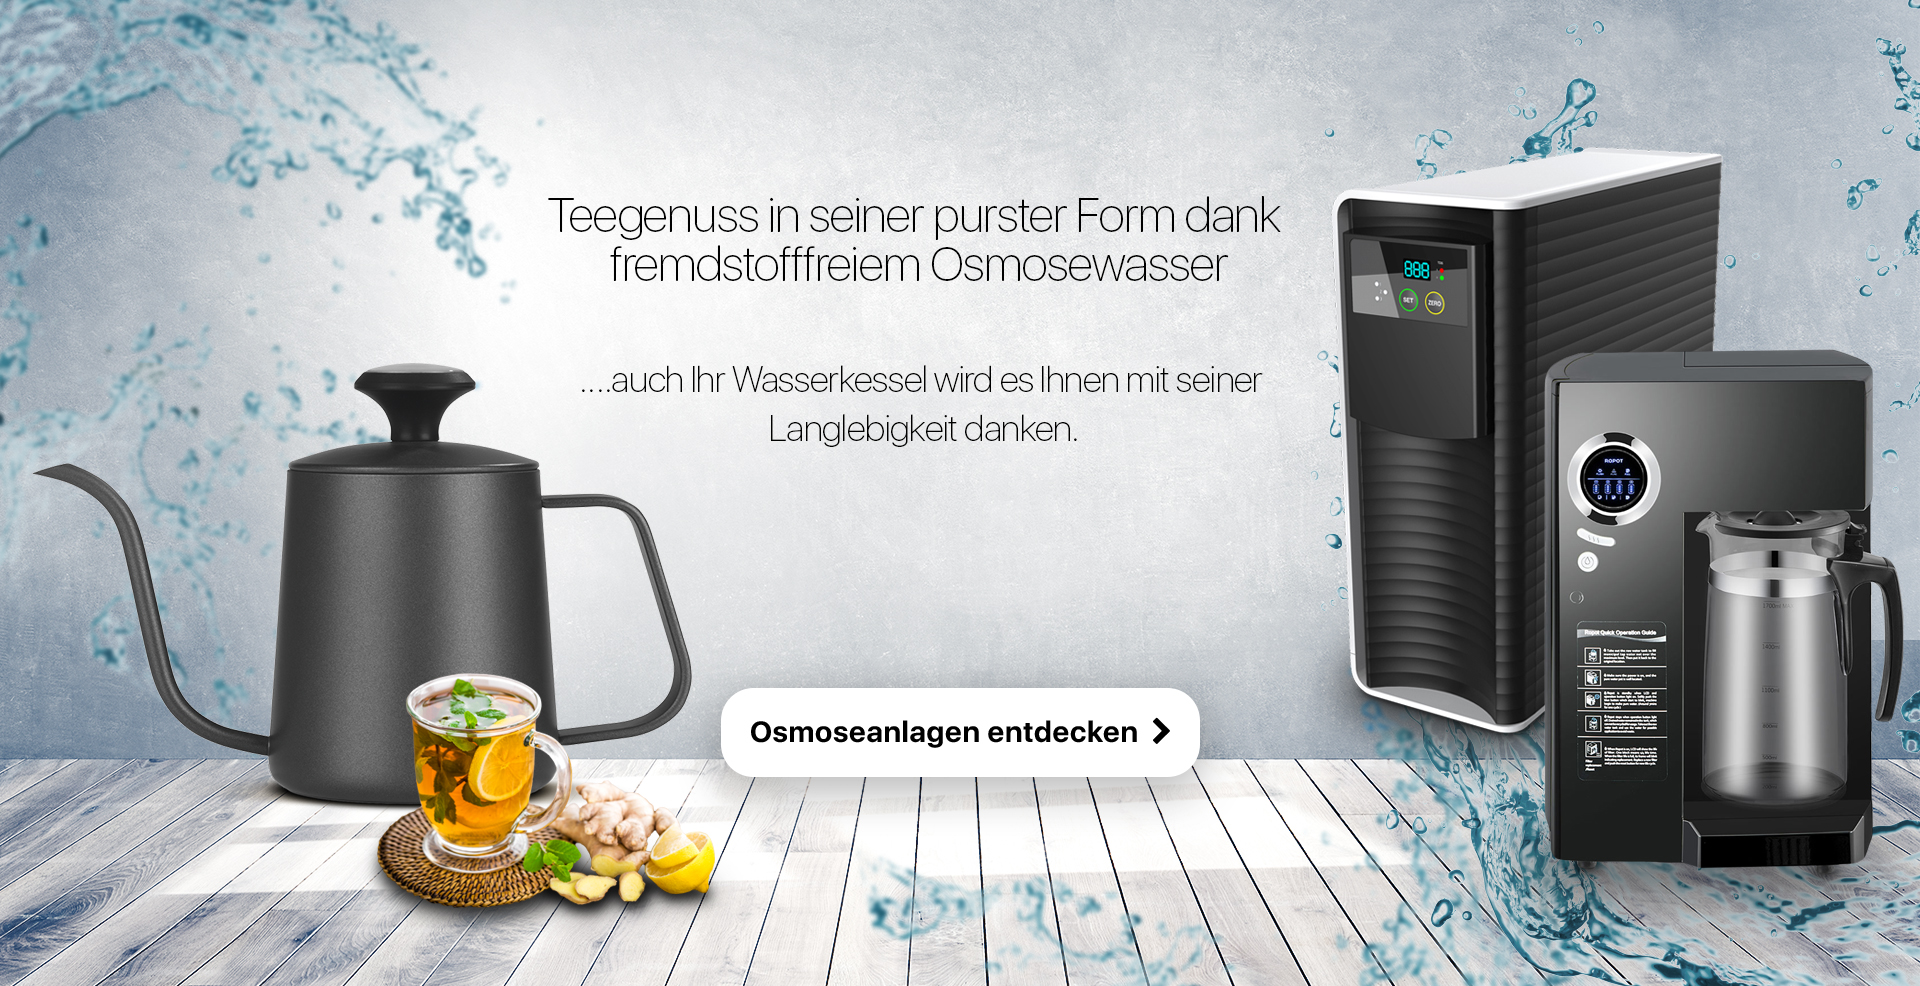 Osmosewasser_ohne-Samoware_07082